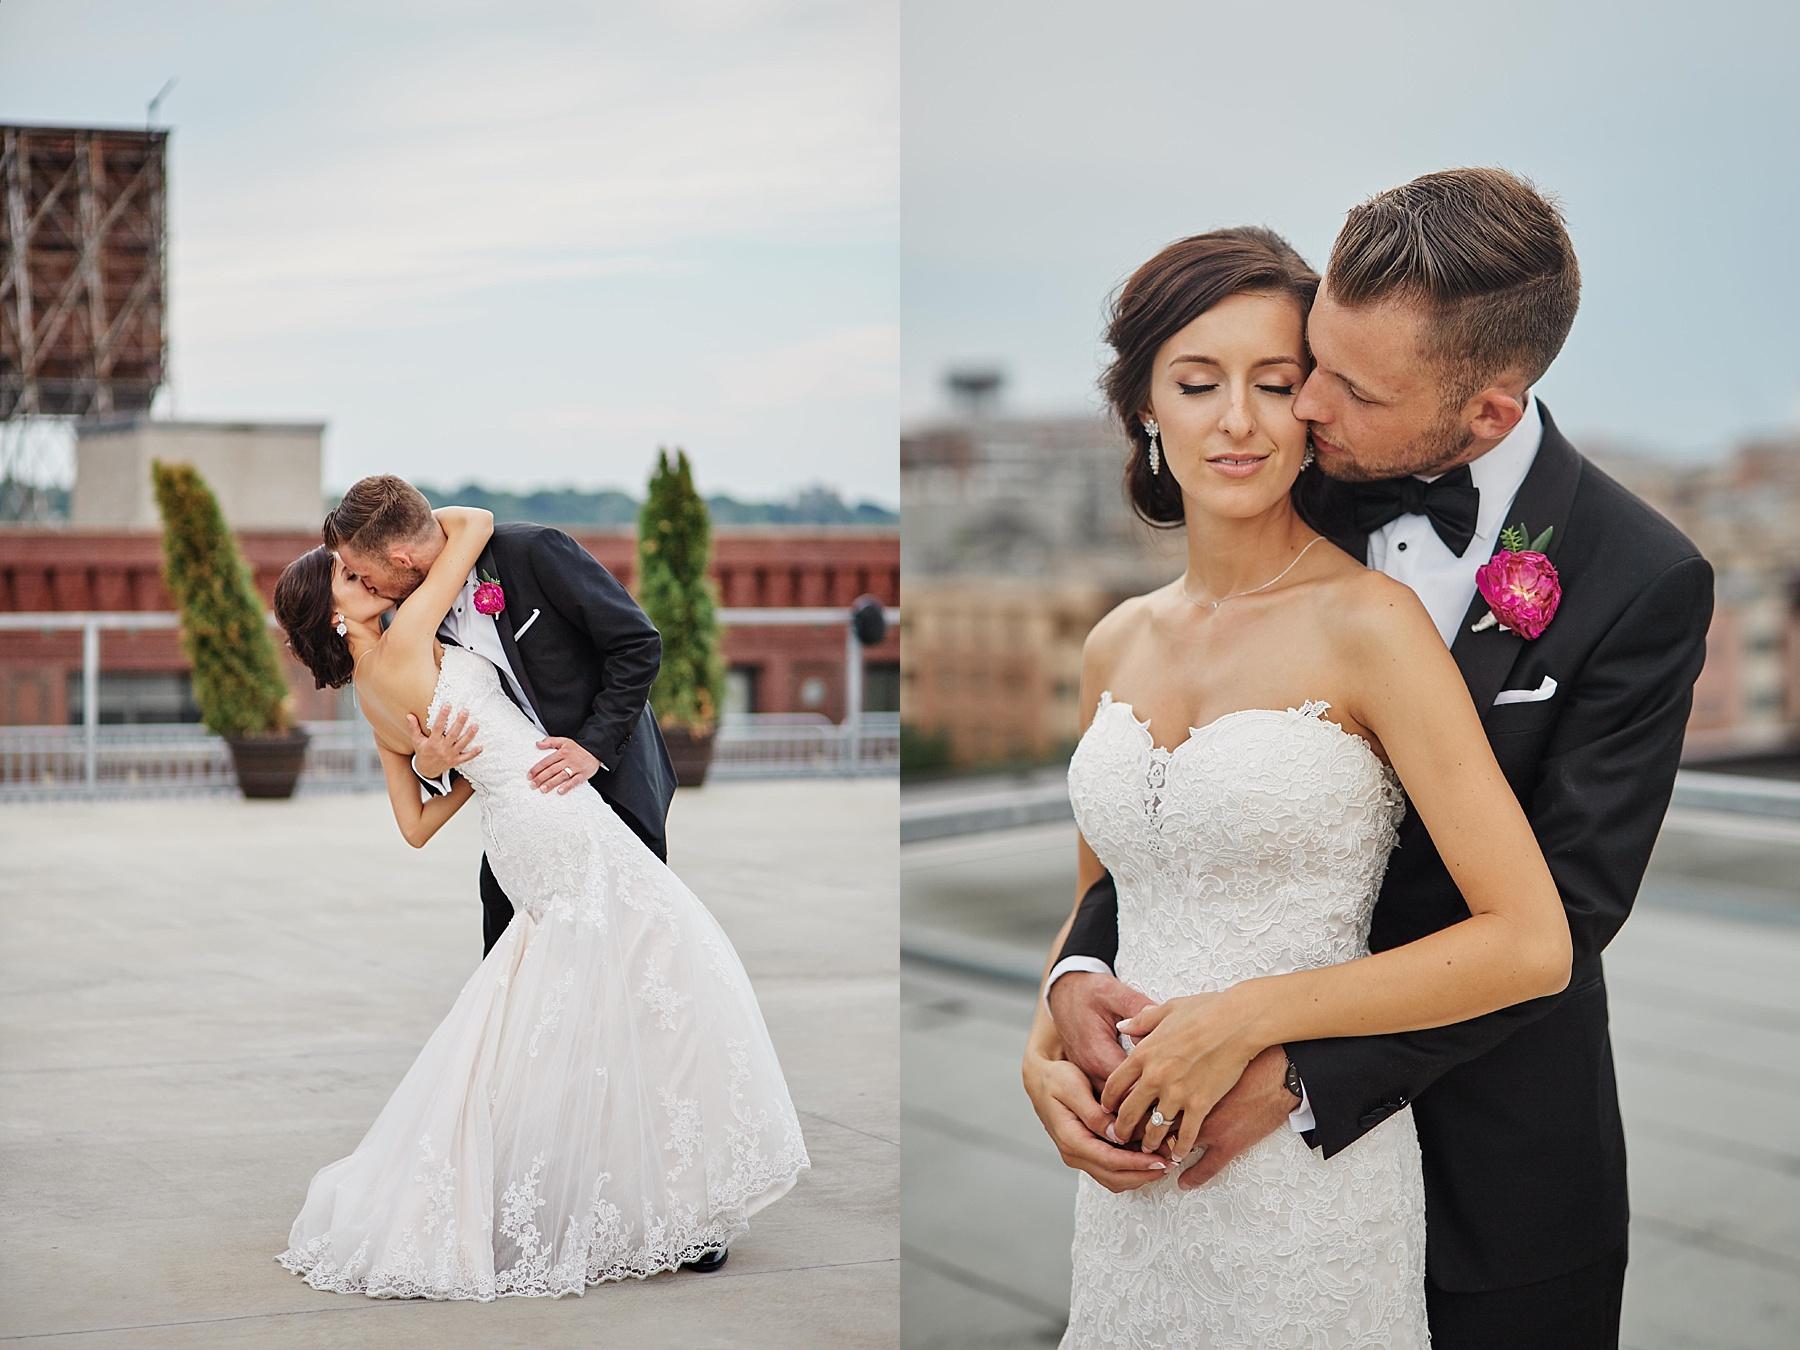 ABULAE-Wedding-Saint-paul-MN-Josh-Sofia-Wedding-Mears-Park_0819.jpg